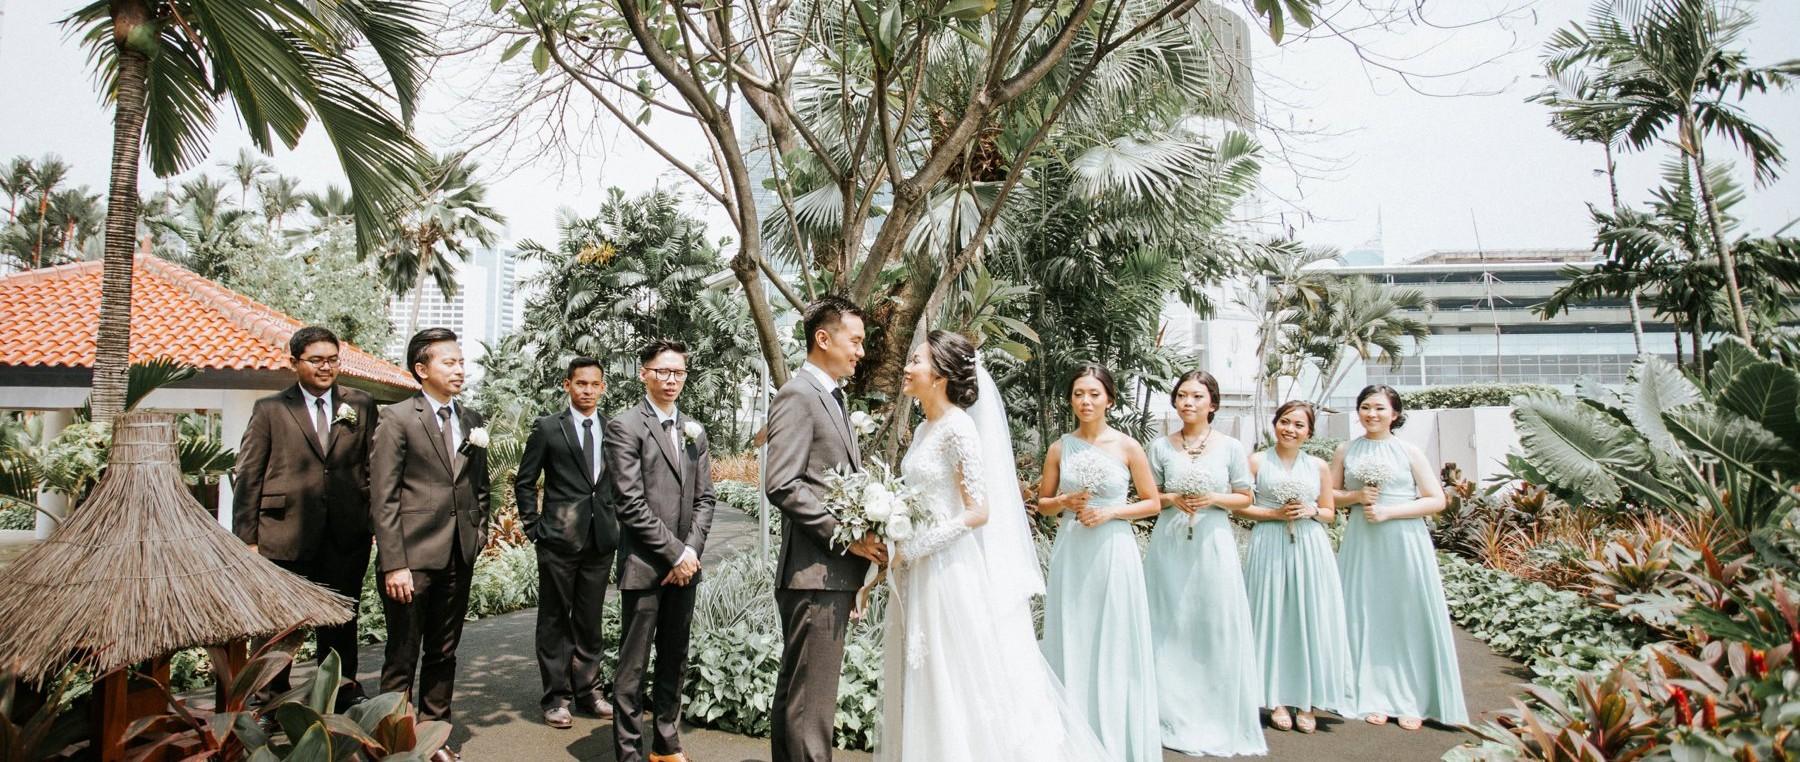 wedding-venue-jakarta-venuerific-blog-residence-on-five-bridegrooms-bridemaids